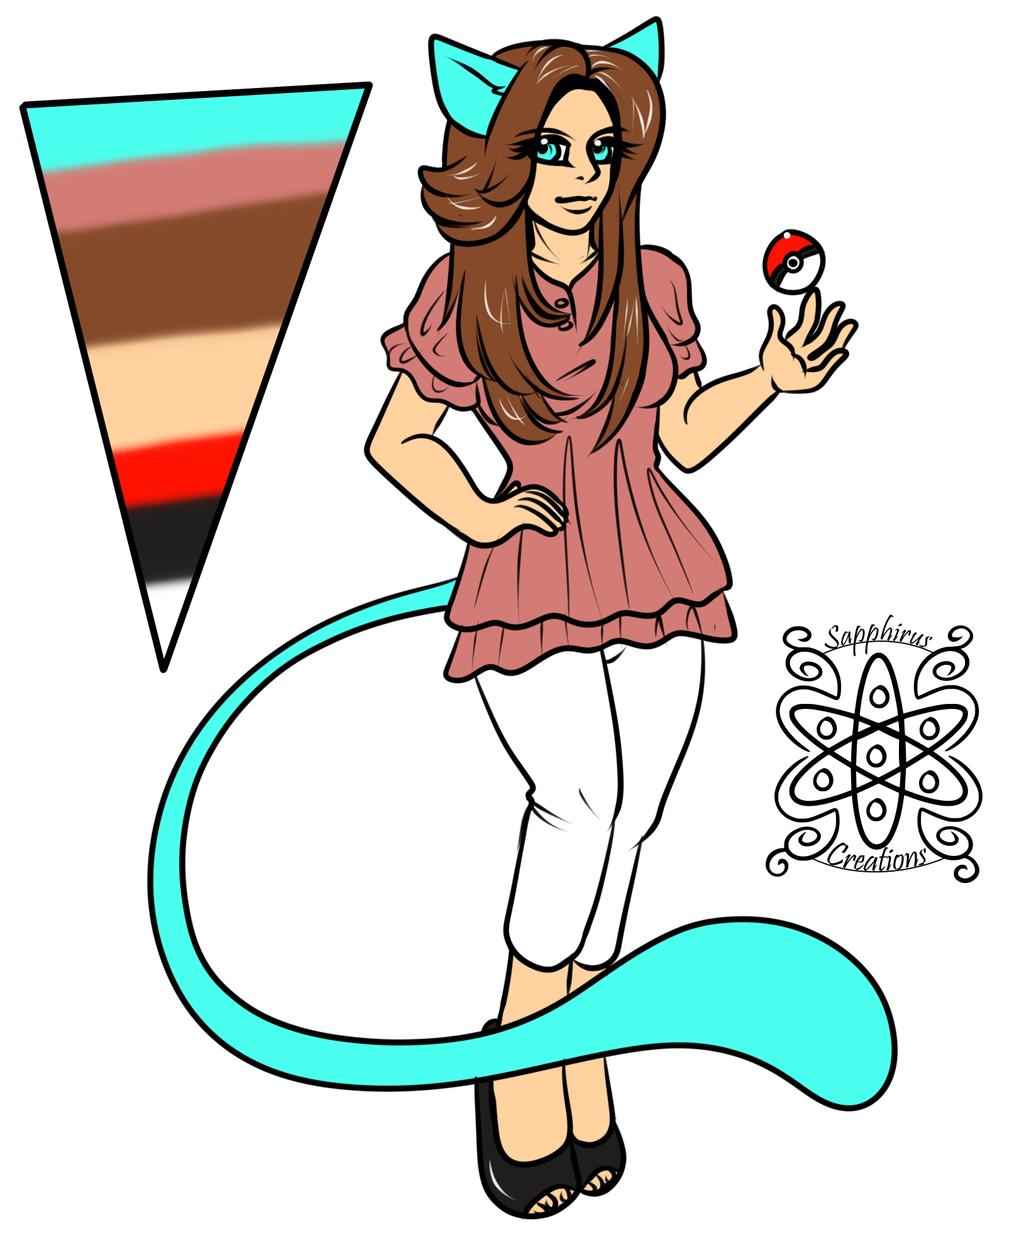 Female Mew Kemono Pokemon Trainer +Flatcolored Commission+